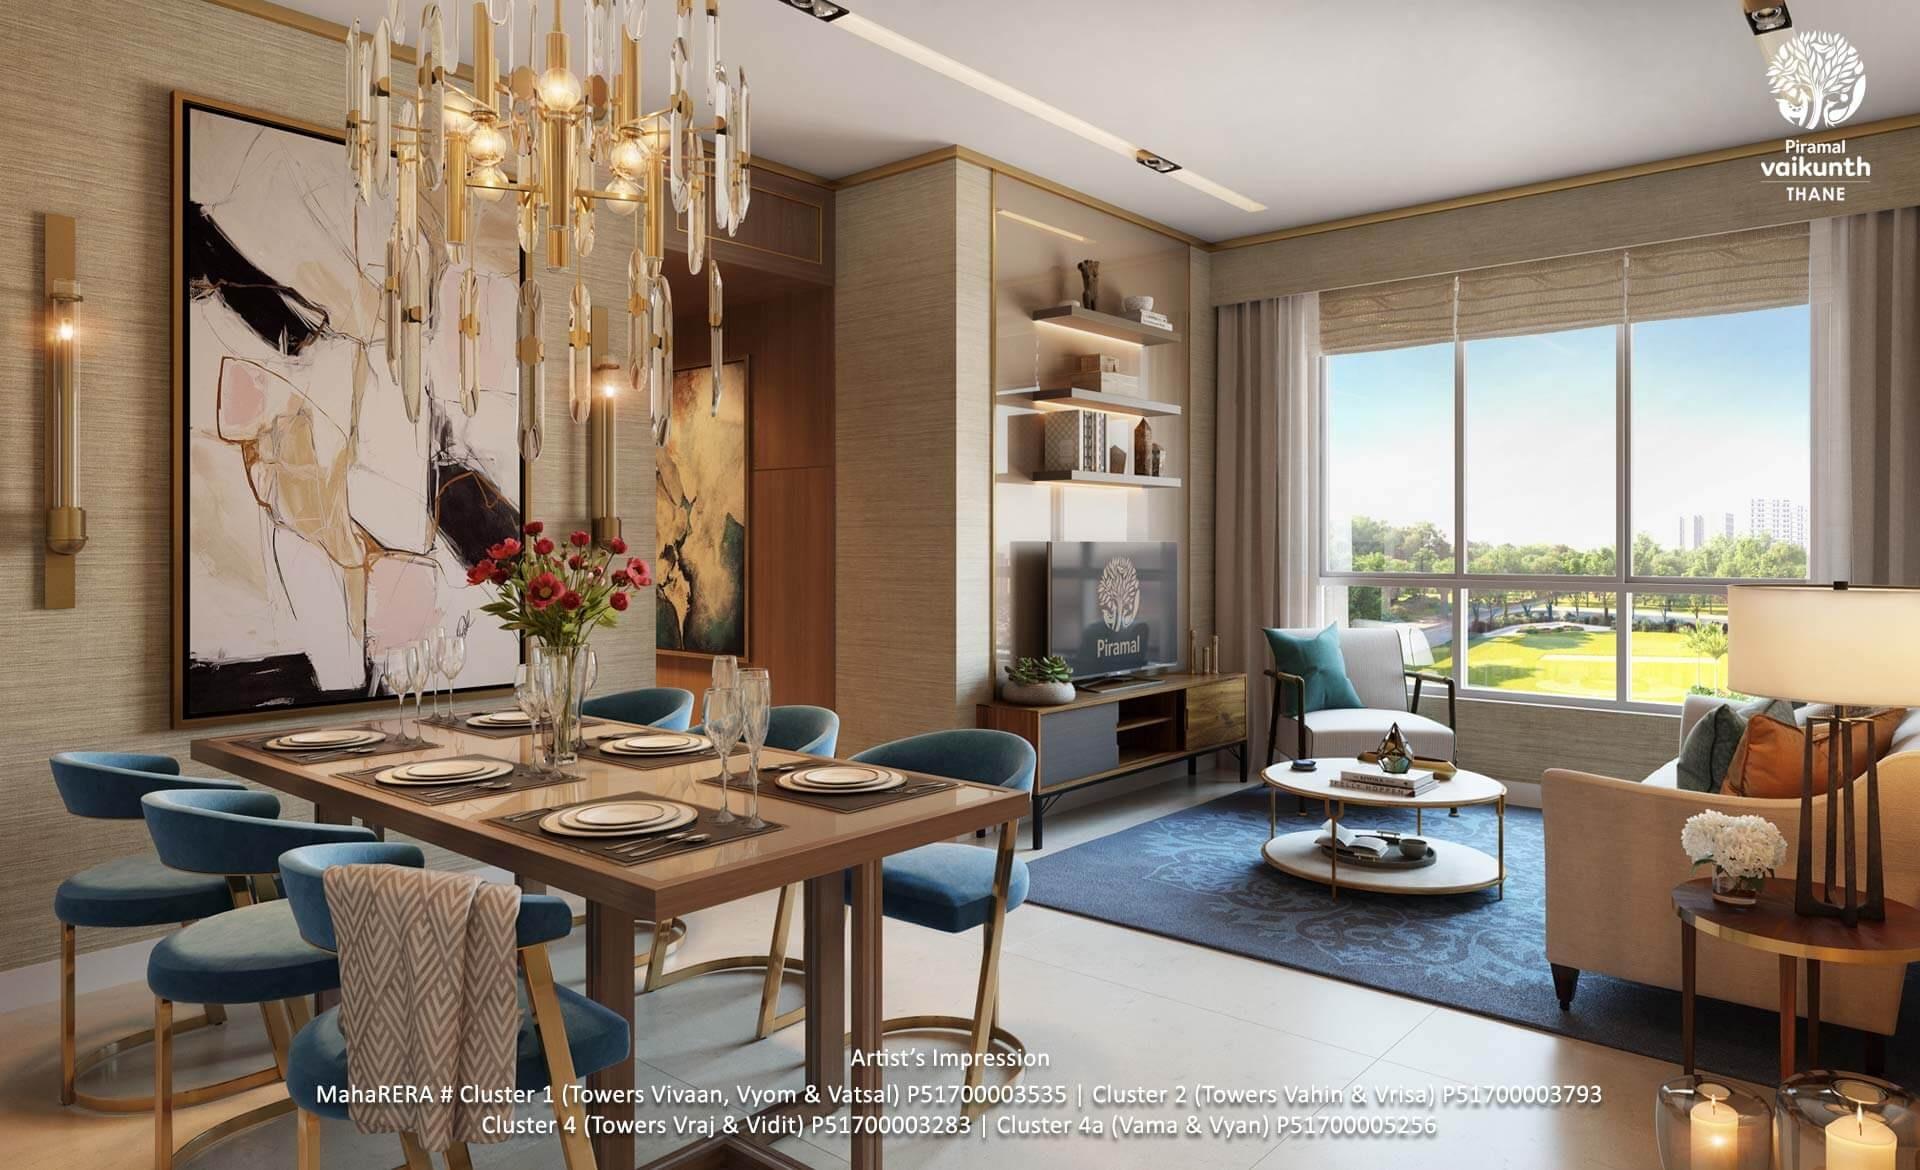 piramal vaikunth project apartment interiors5